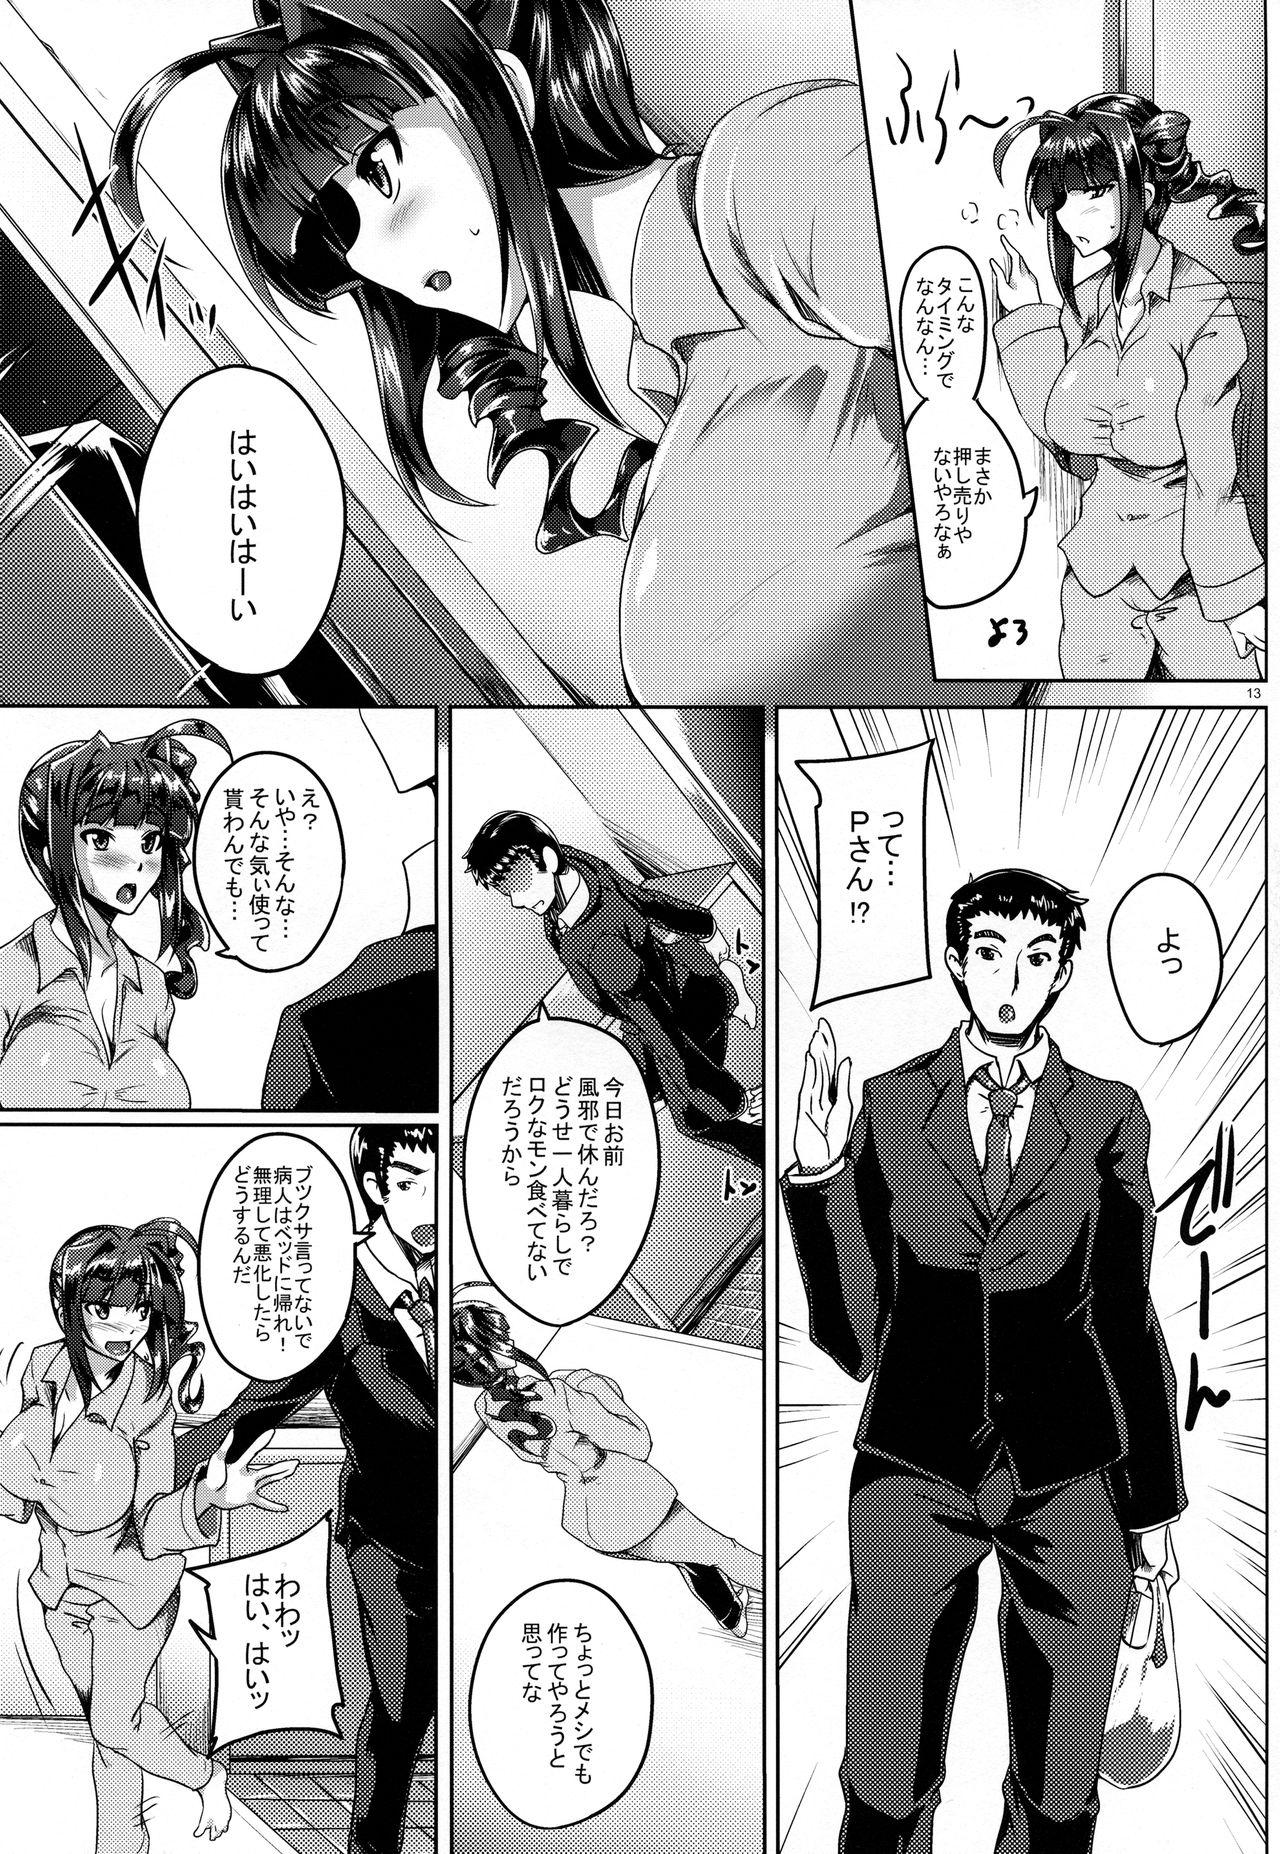 Nao-chan Binetsu SOS!! 11